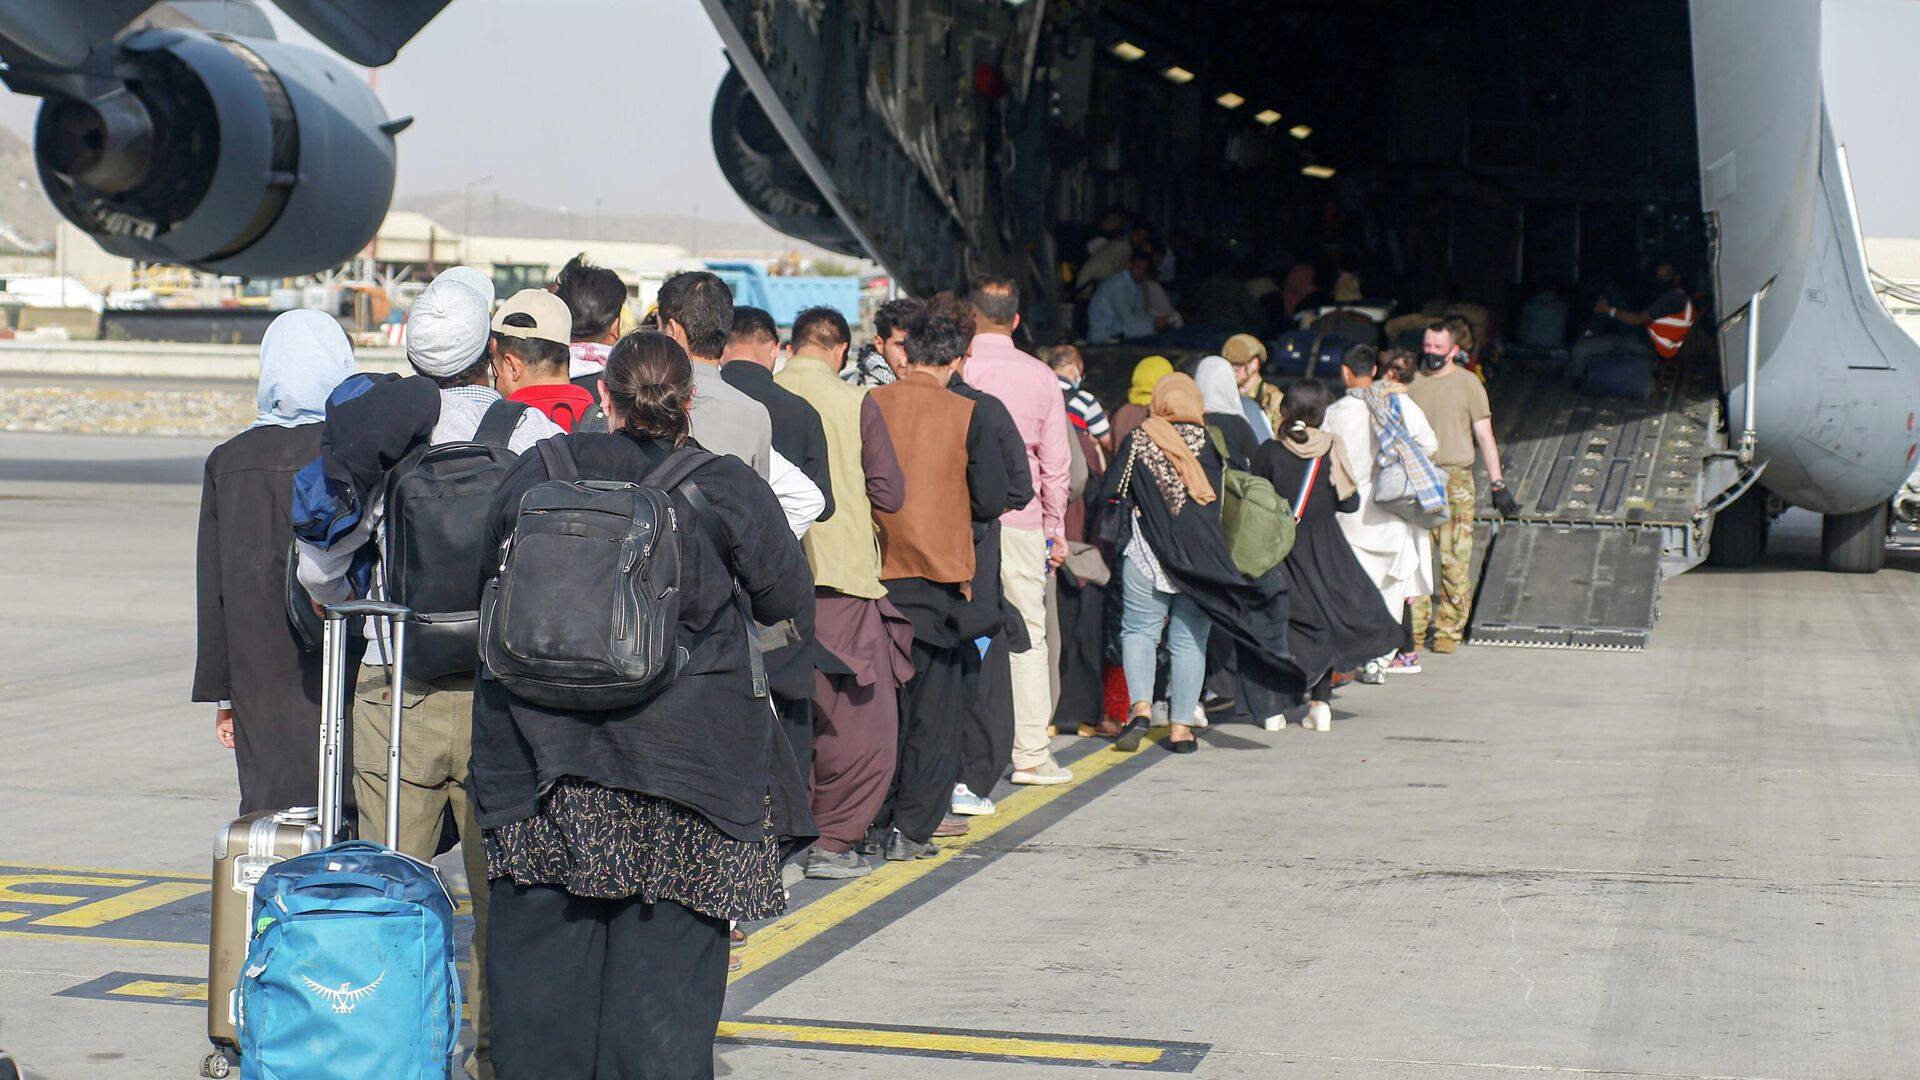 Las evacuaciones en Kabul, Afganistán - Sputnik Mundo, 1920, 22.08.2021